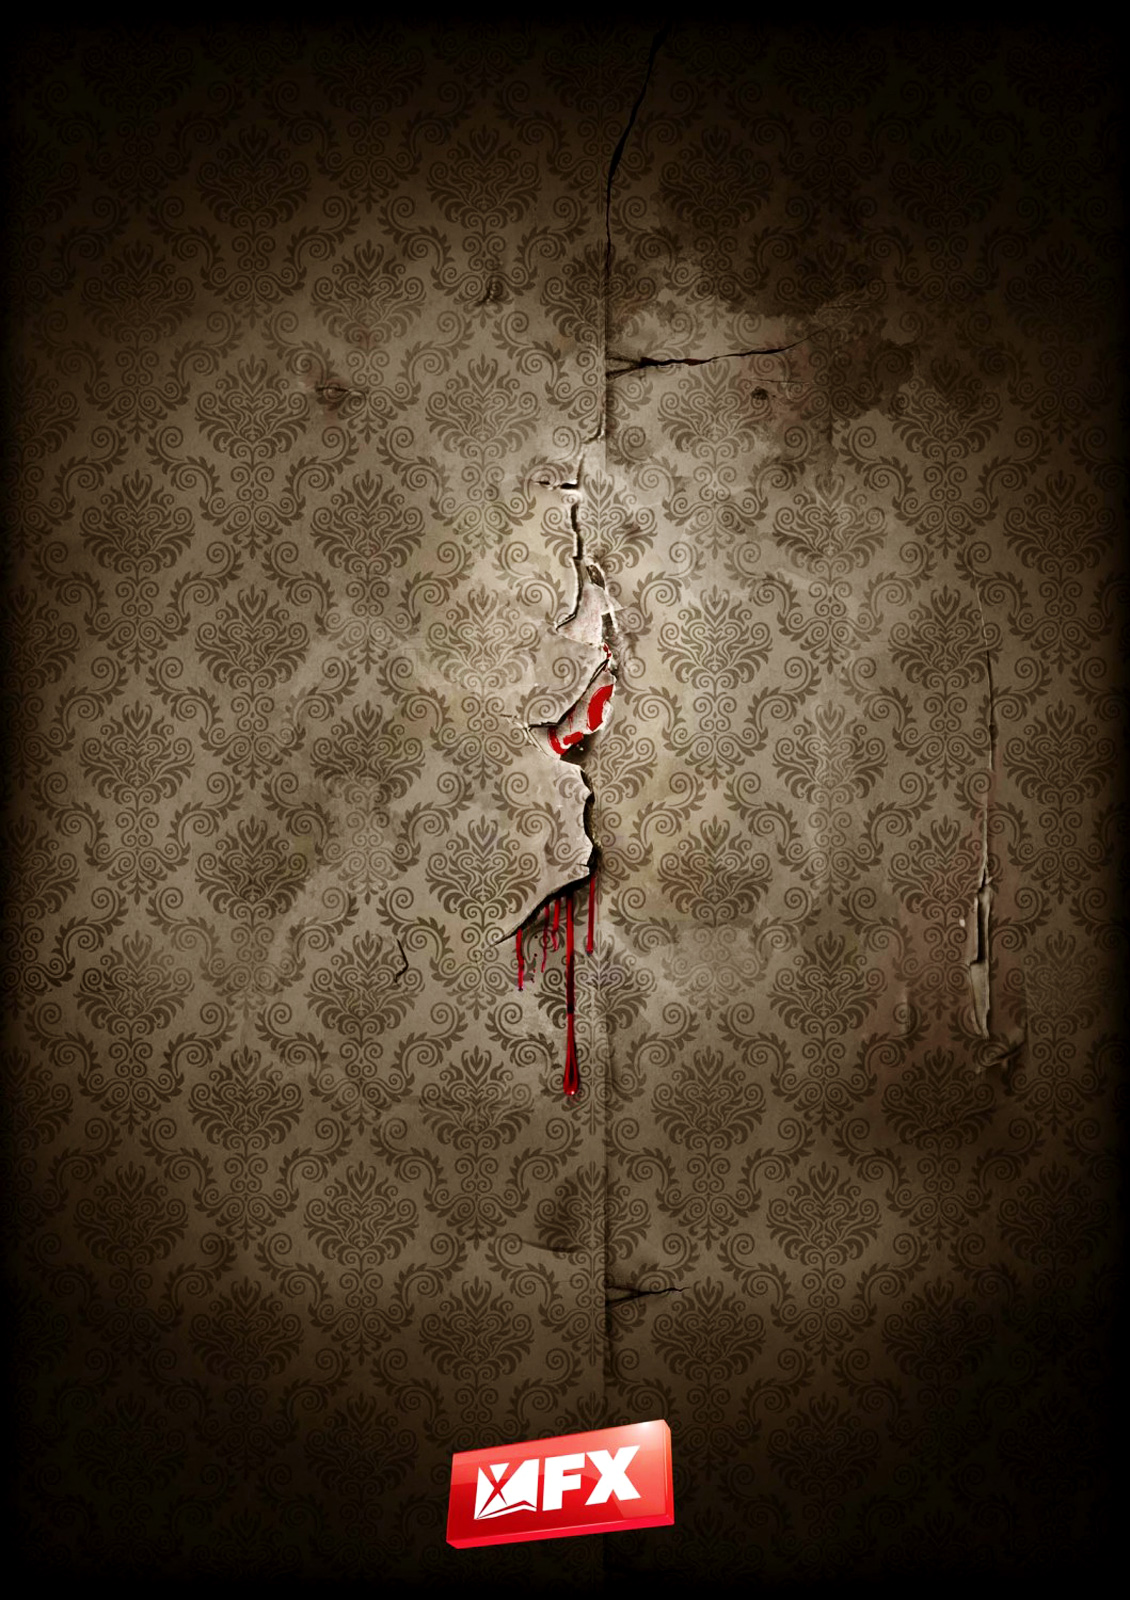 Horror Story Asylum Tv Series HD Wallpapers Desktop Wallpaper 1130x1600